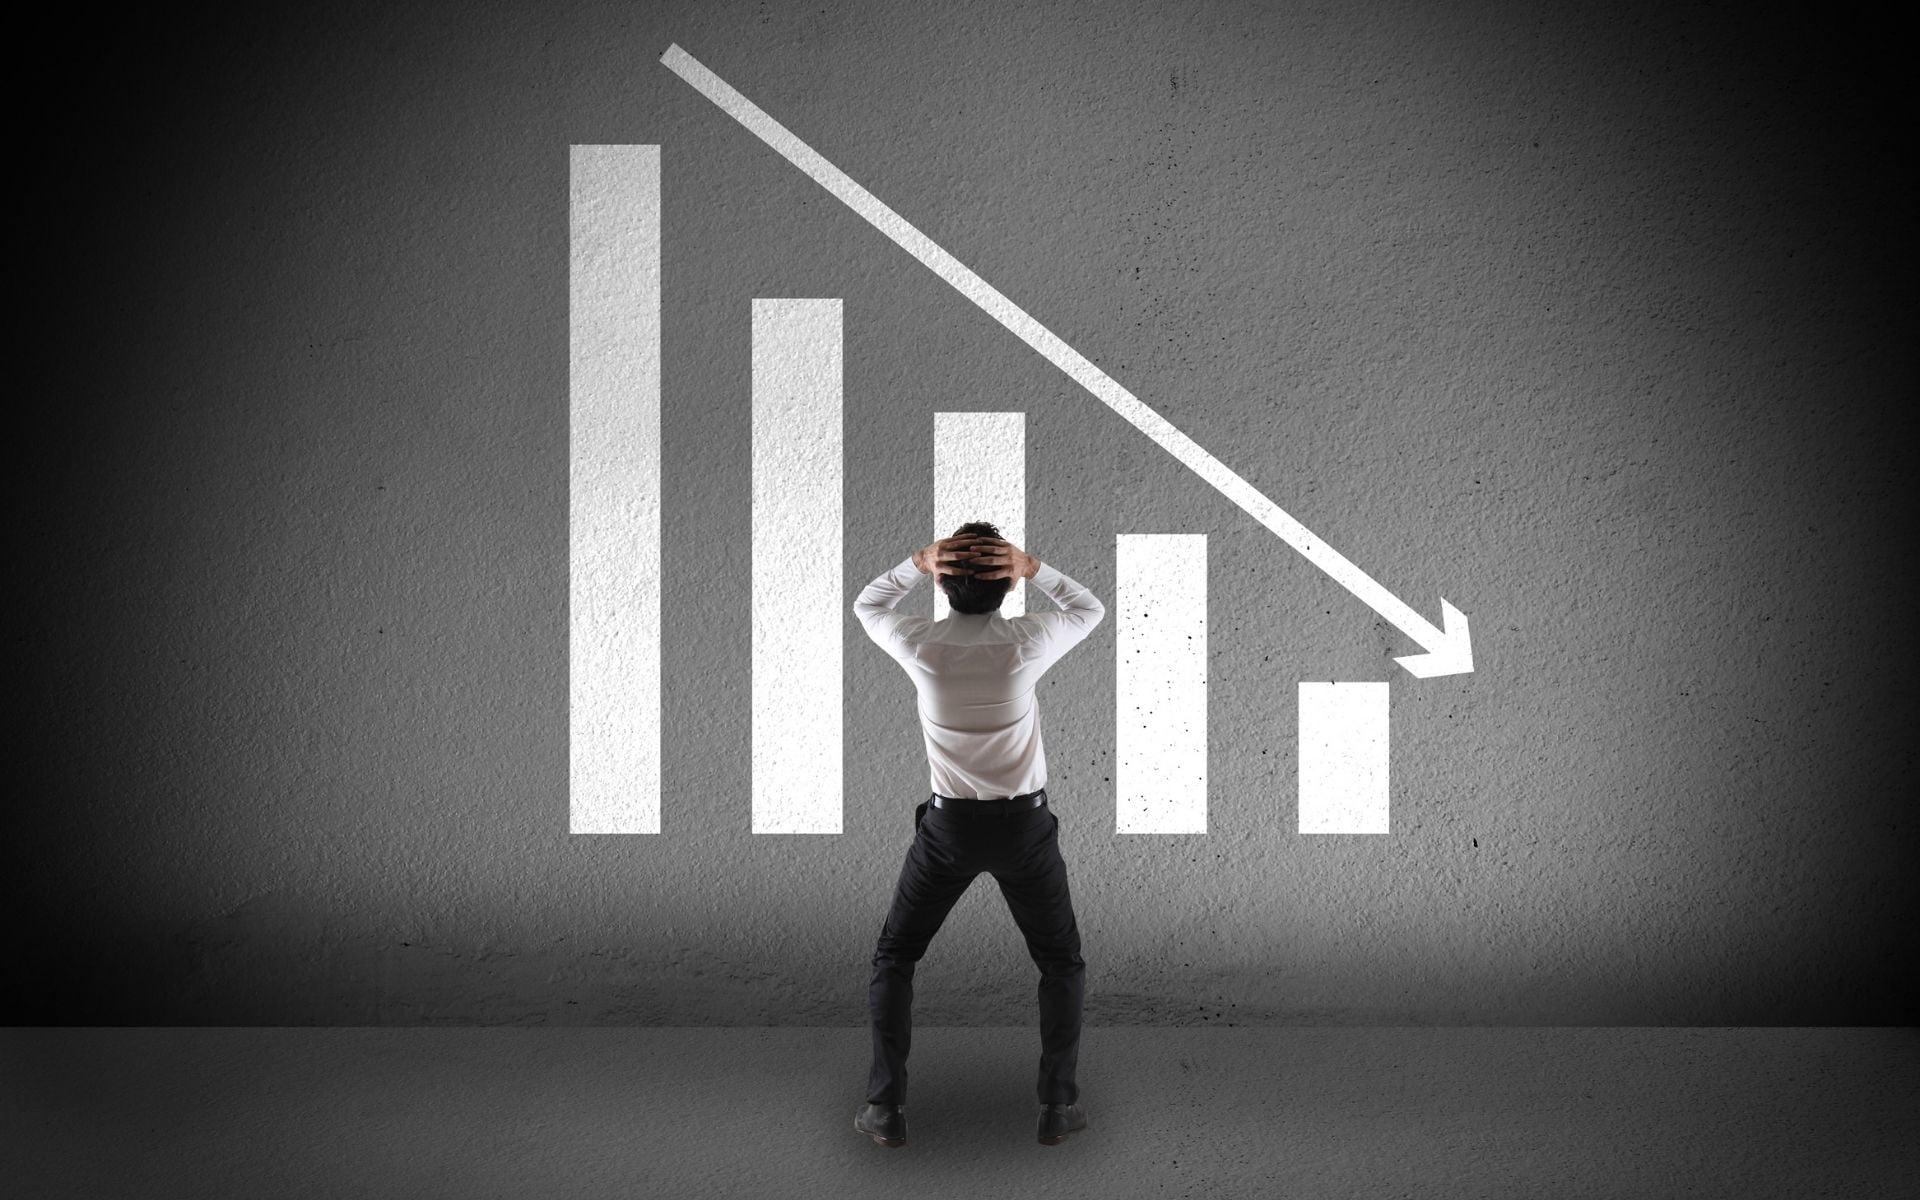 Imprese in declino post pantemia